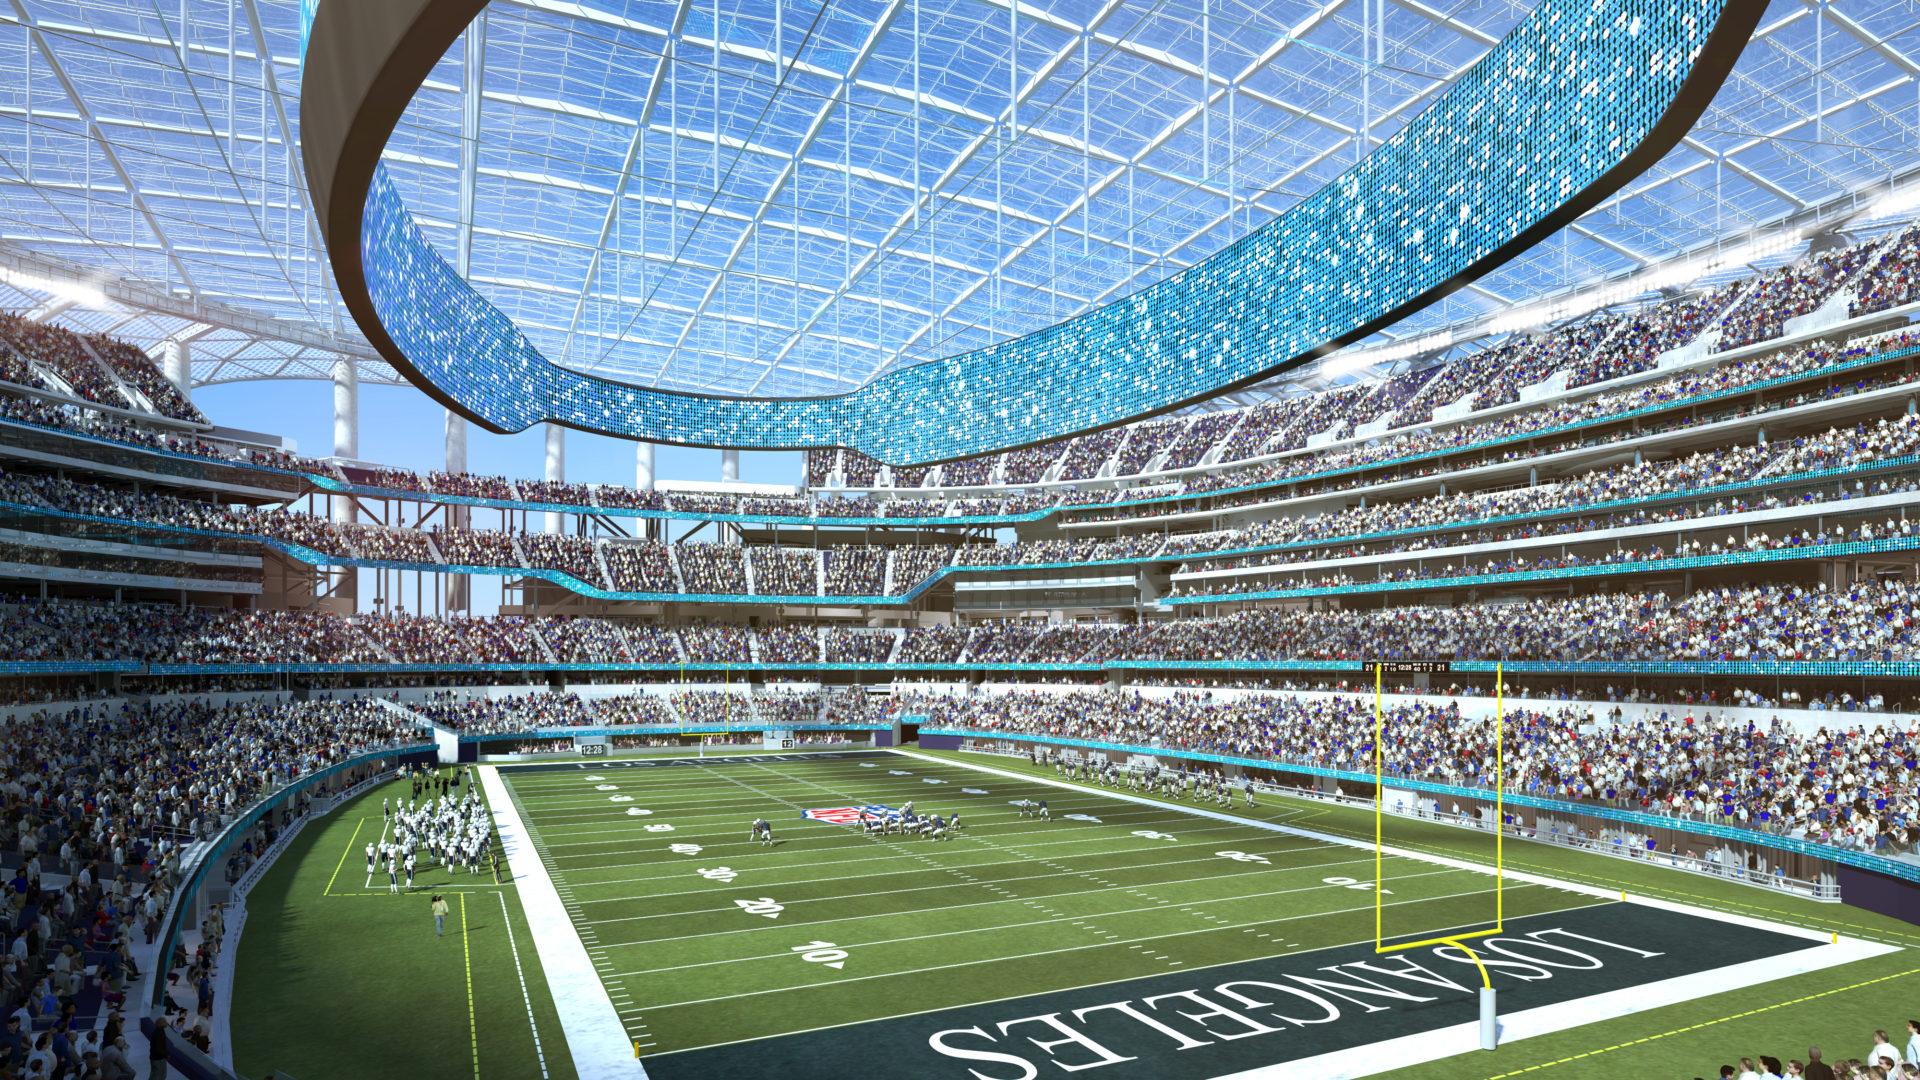 Stadium Level 3 Southeast Seating Bowl